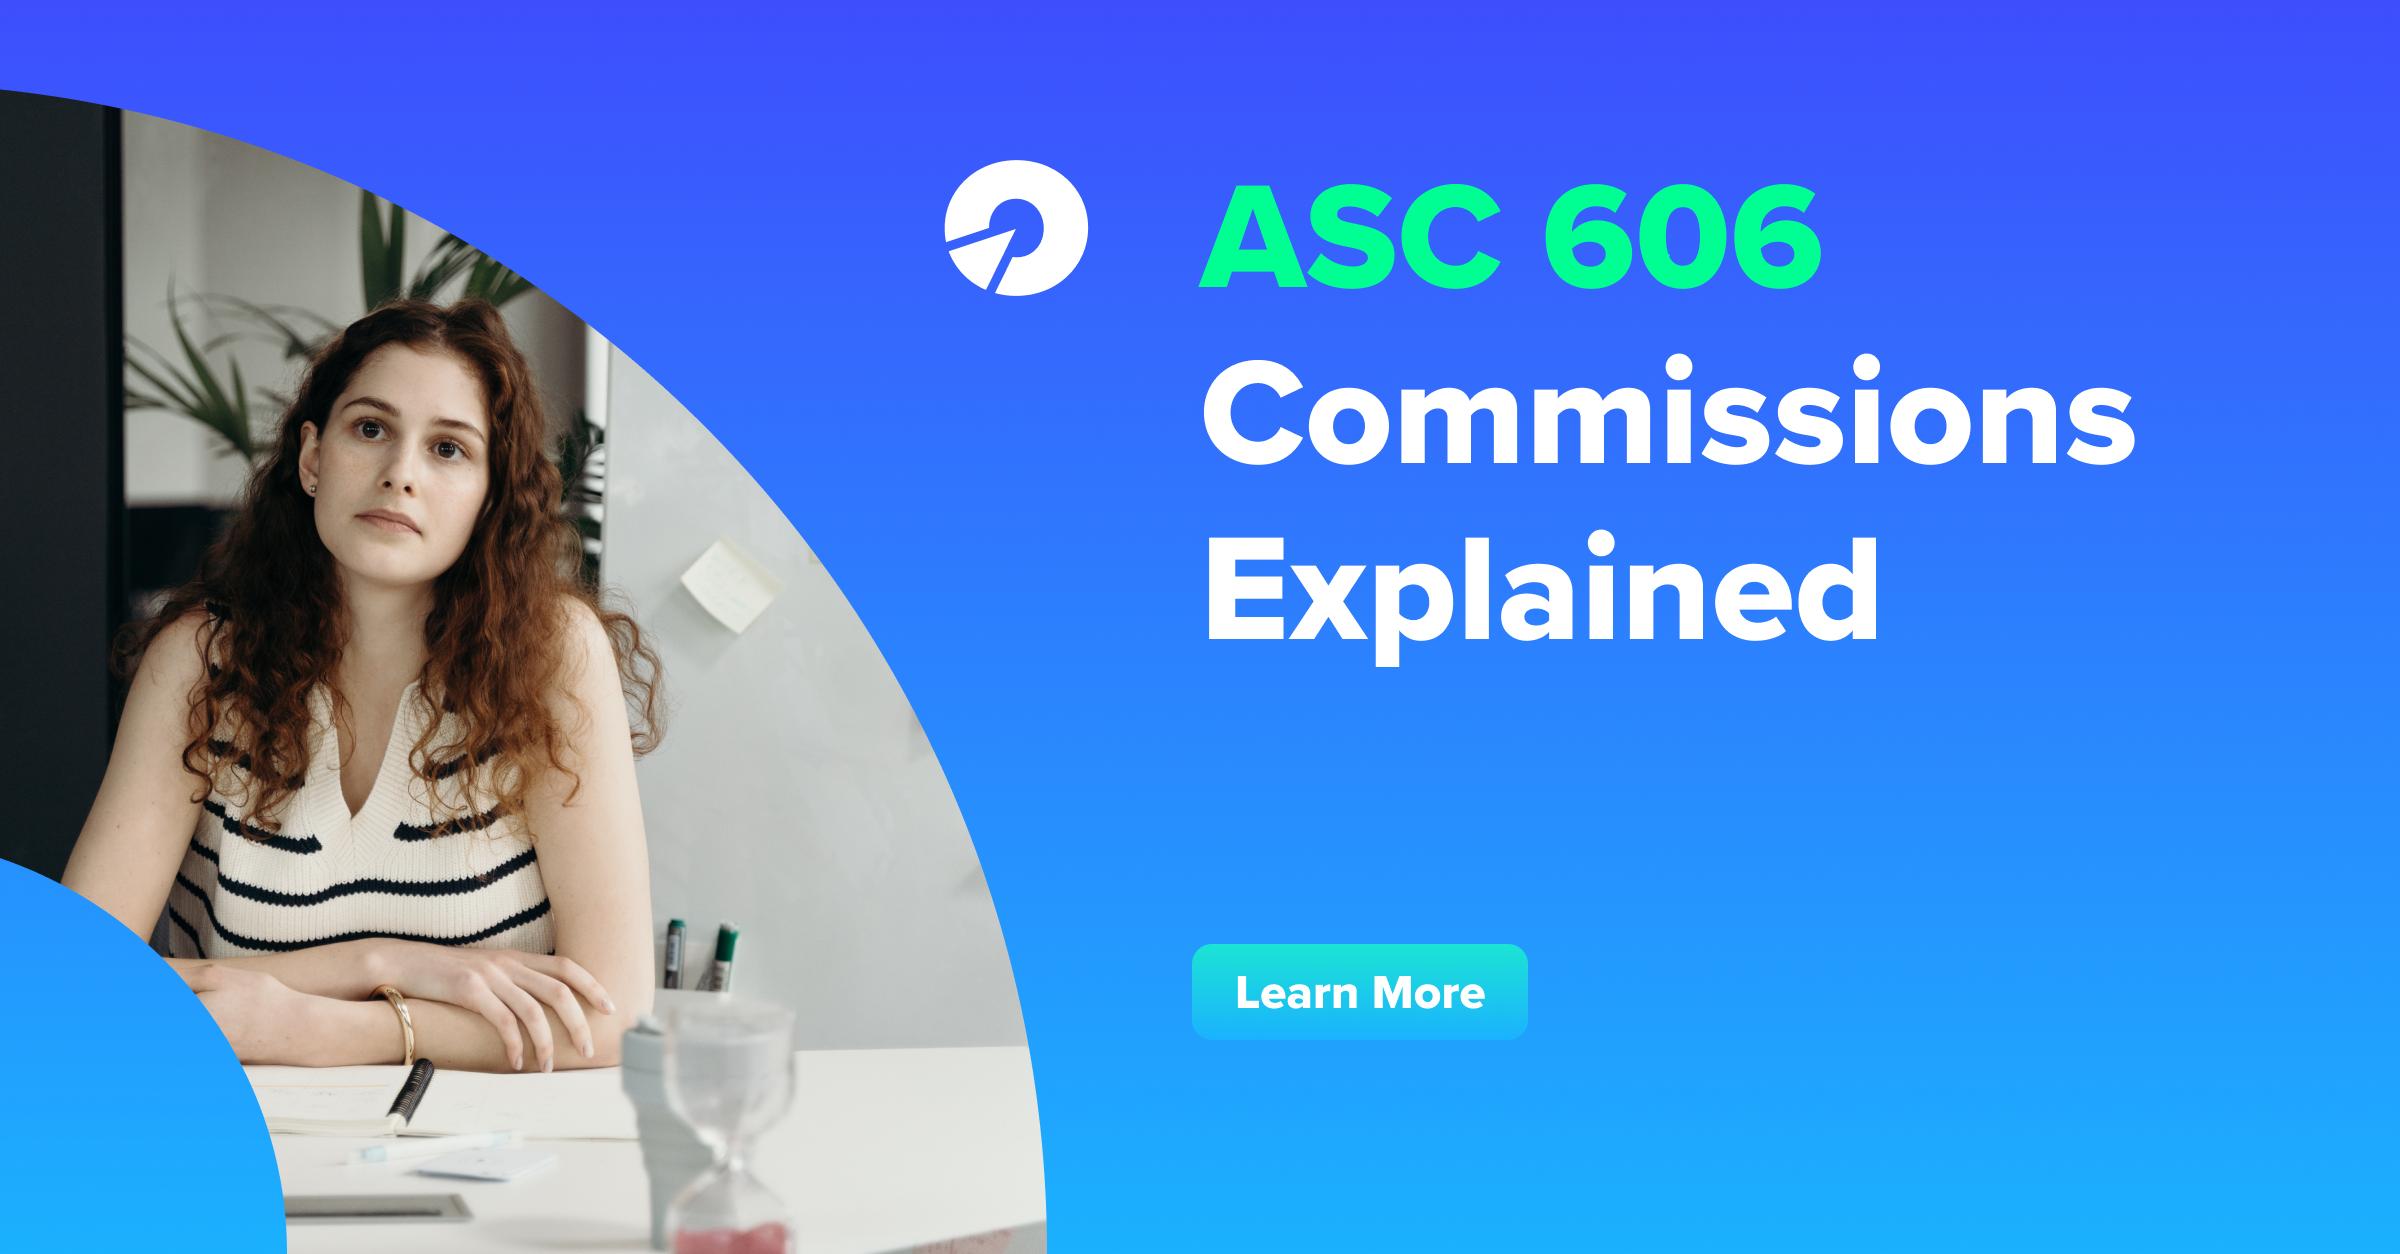 ASC 606 Commissions Explained